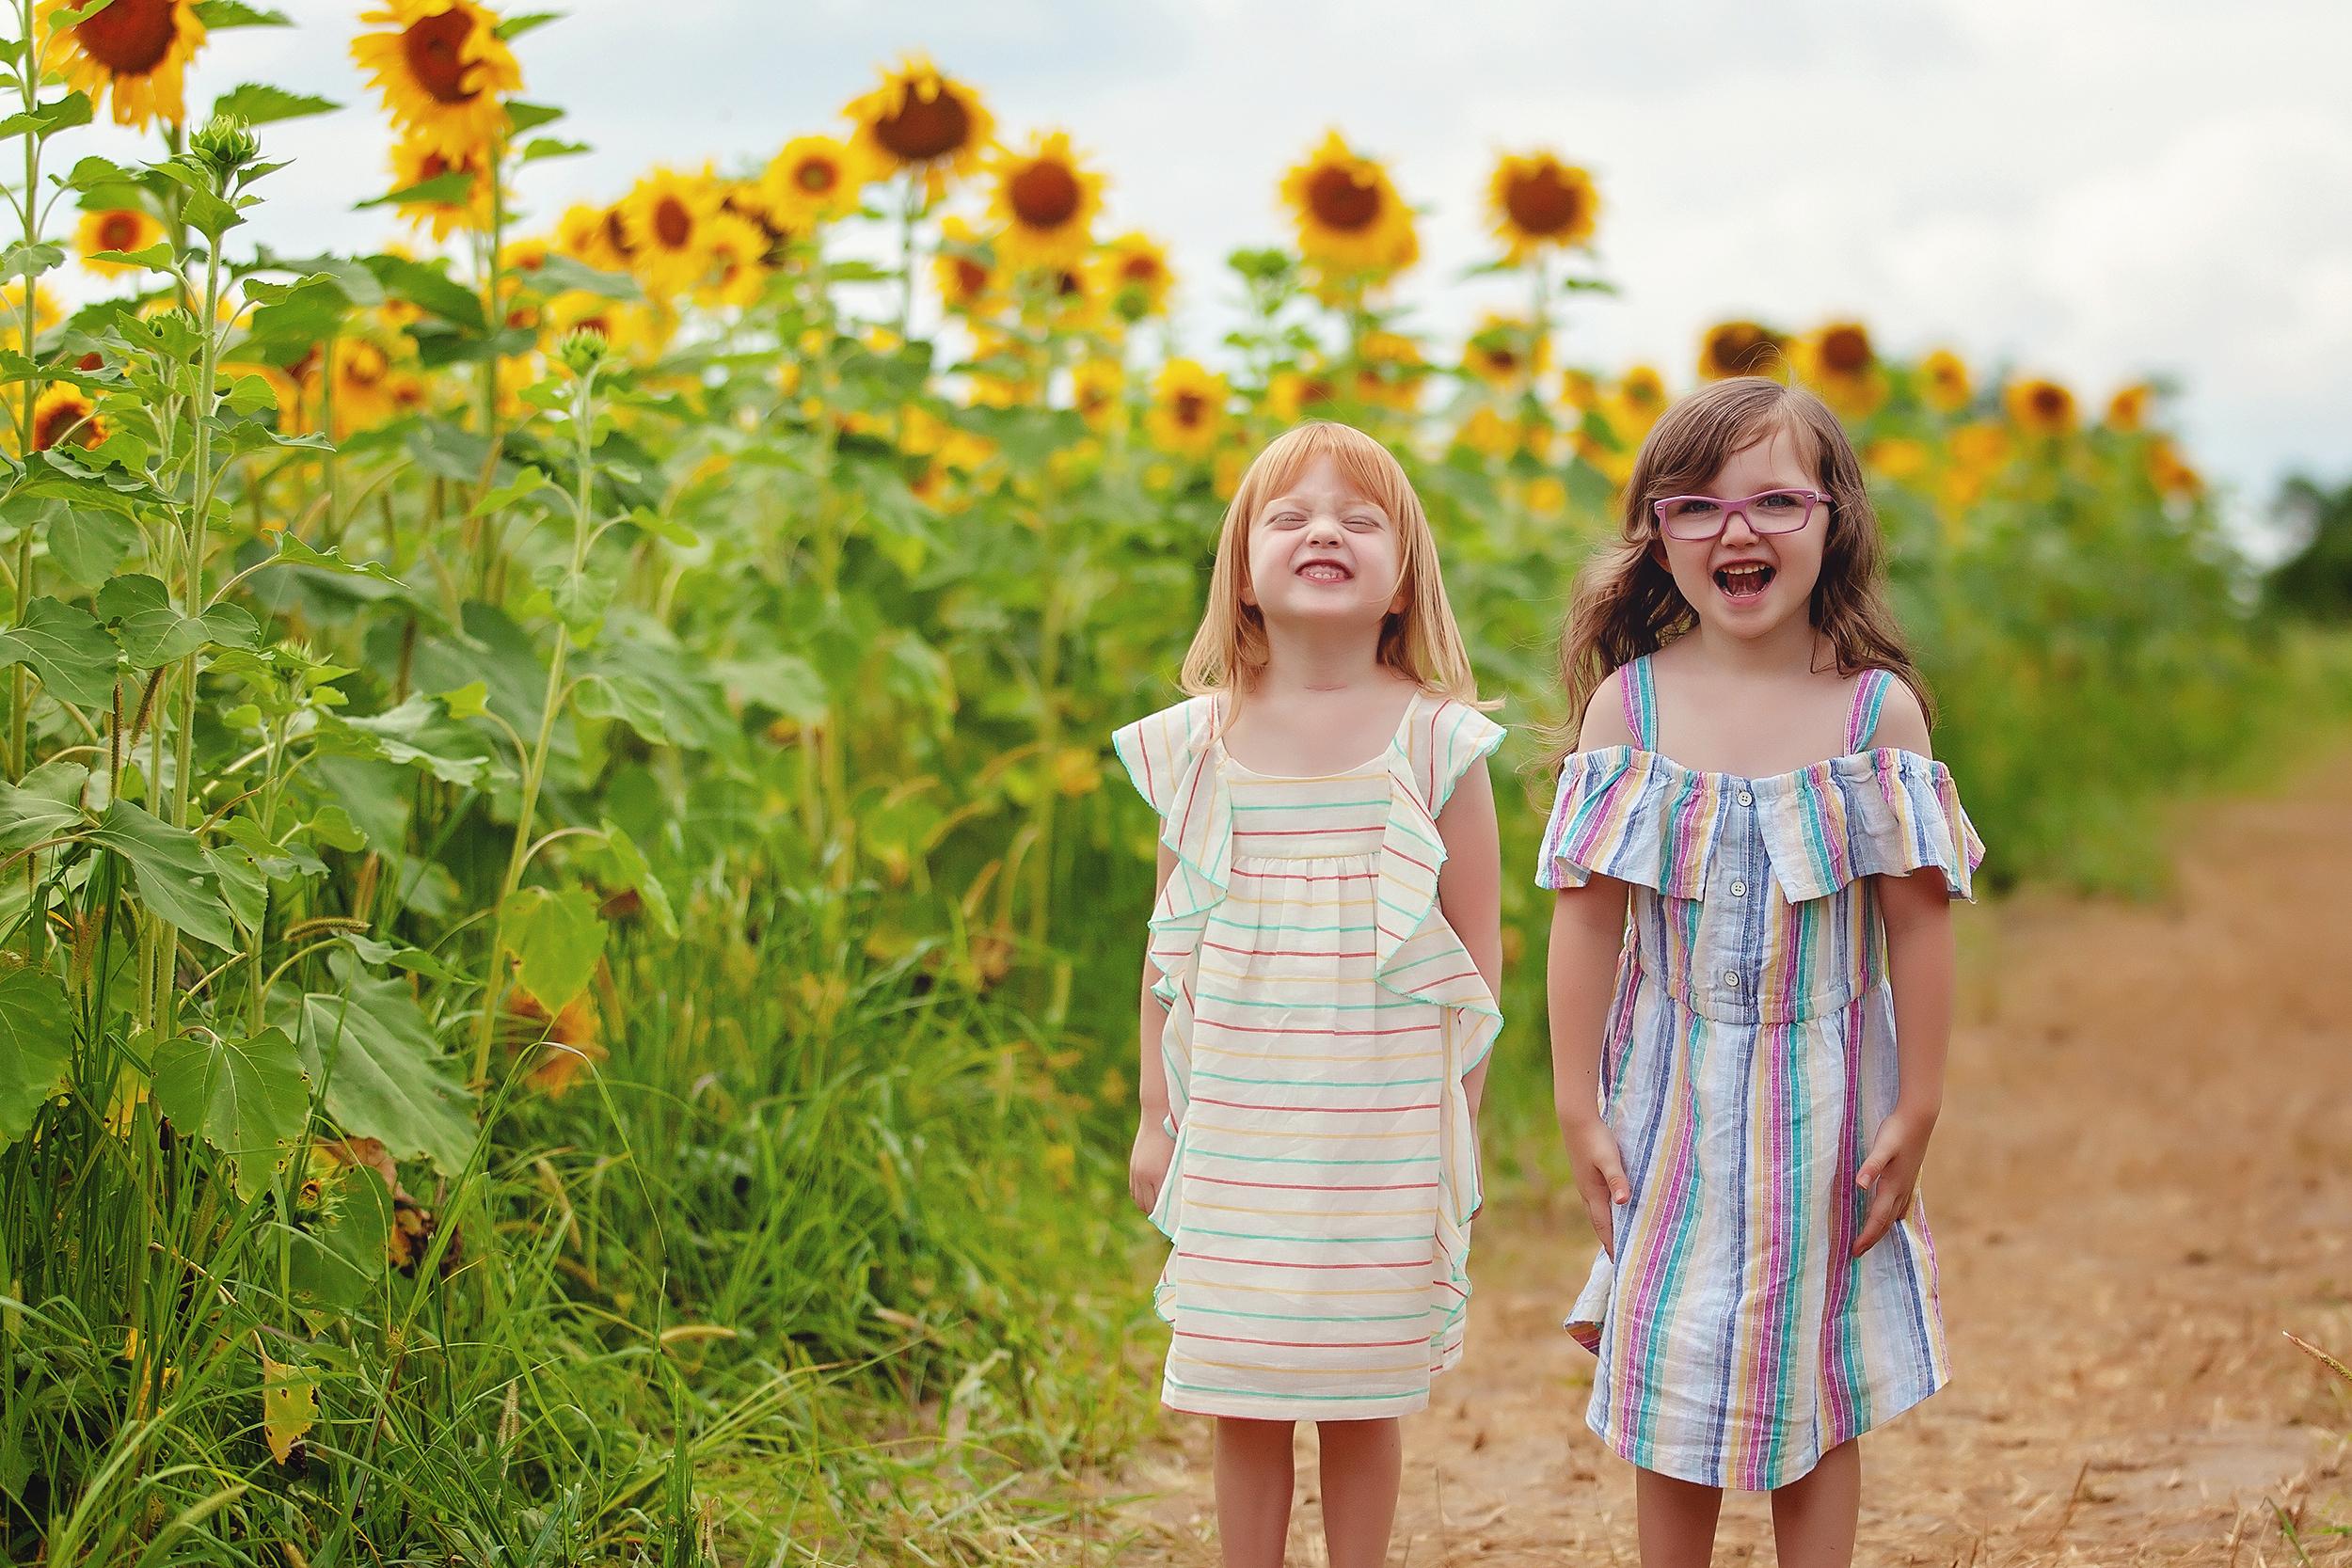 outdoor-childrens-photographer-kent-stow-hudson-ohio.jpg